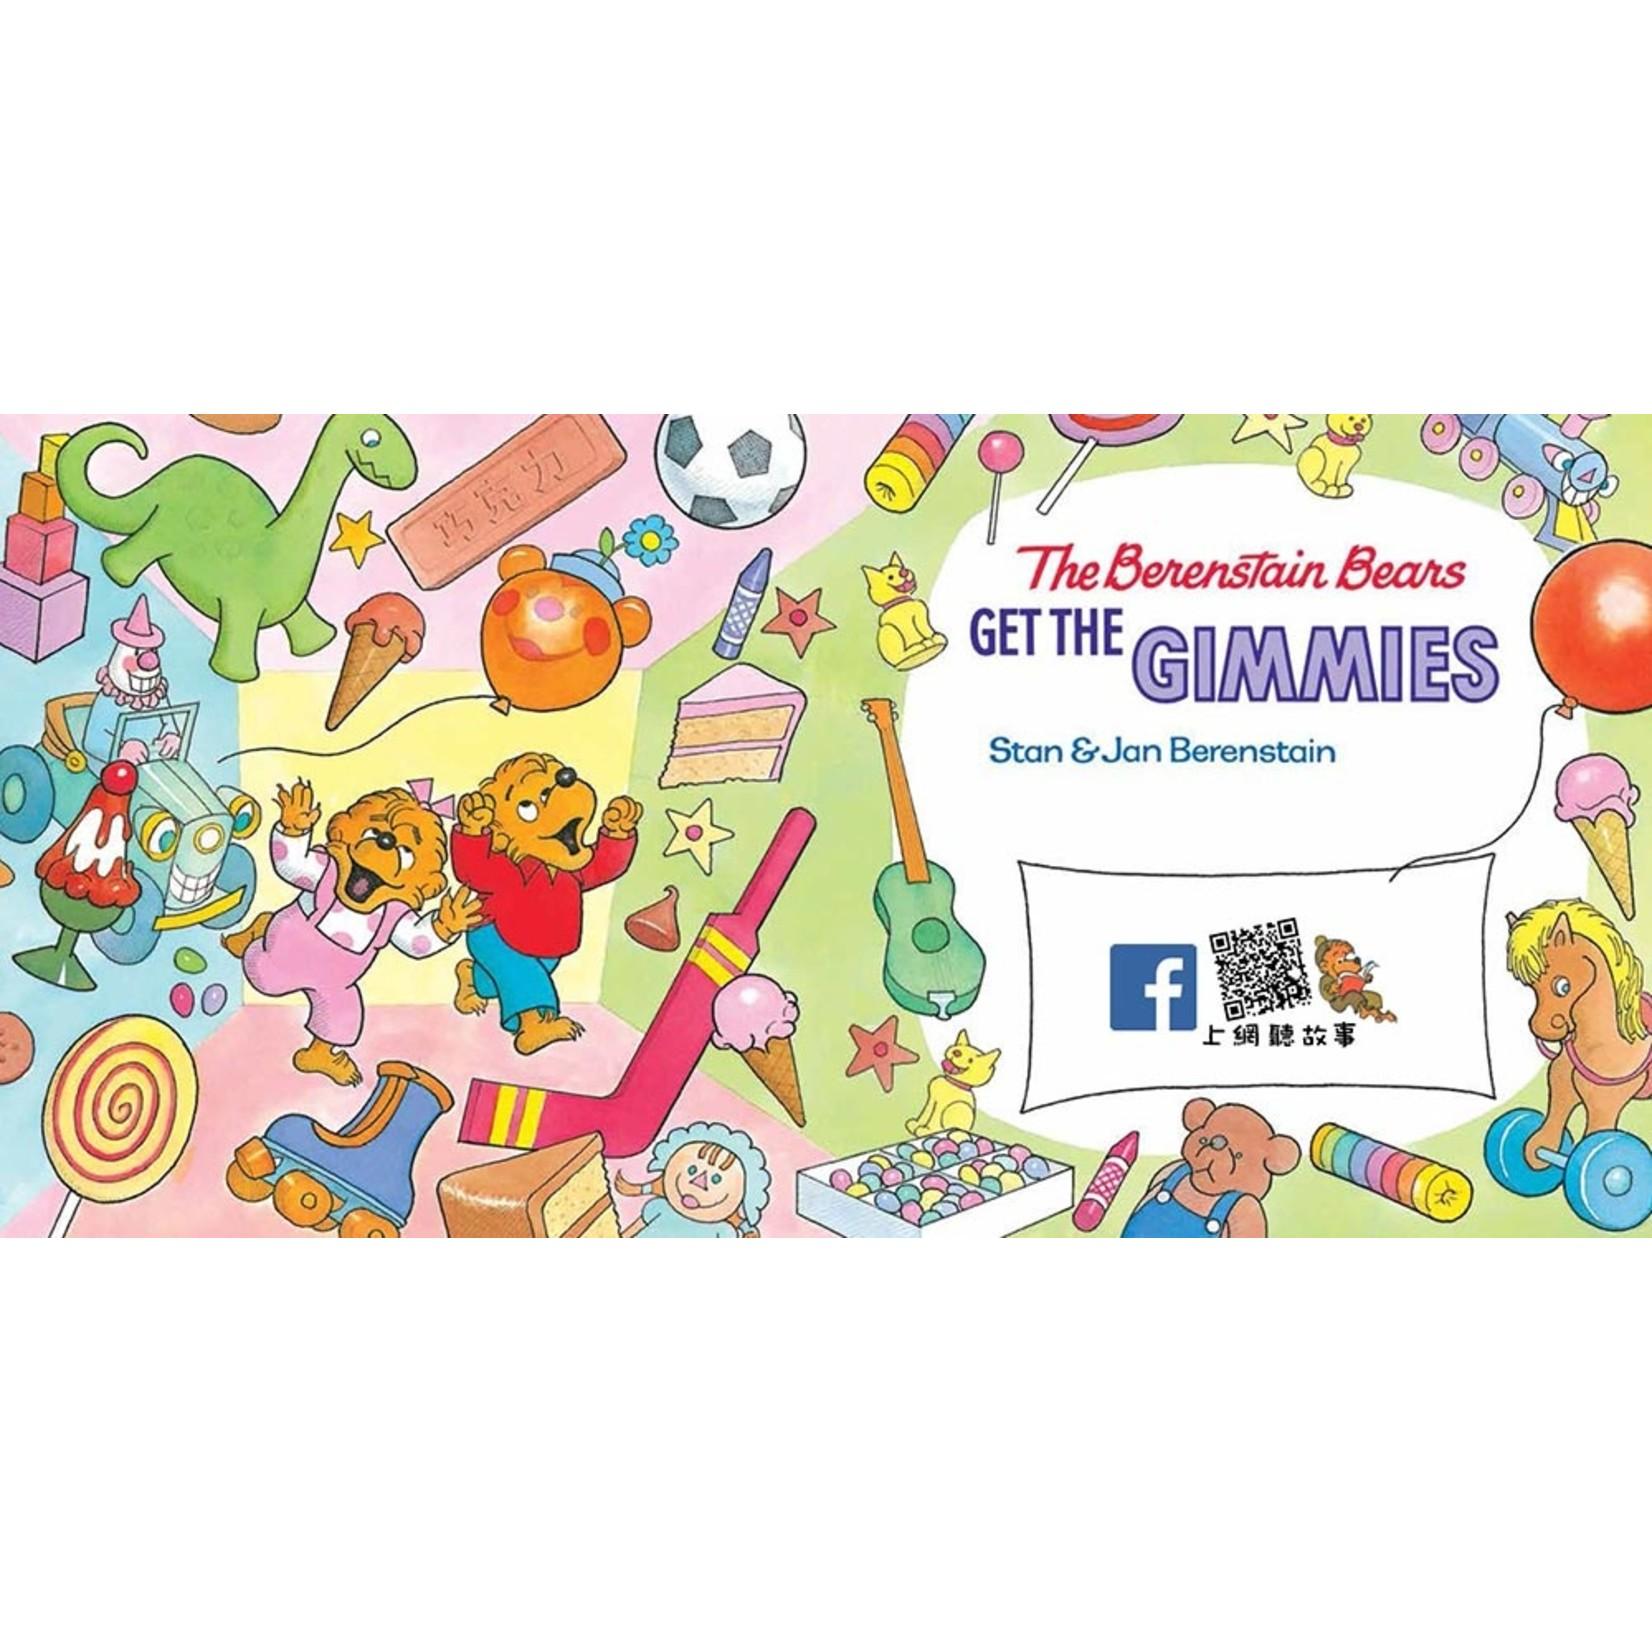 生命樹 Life Tree Global 貝安斯坦熊系列03:什麼都想要 The Berenstain Bears 03: Get The Gimmies